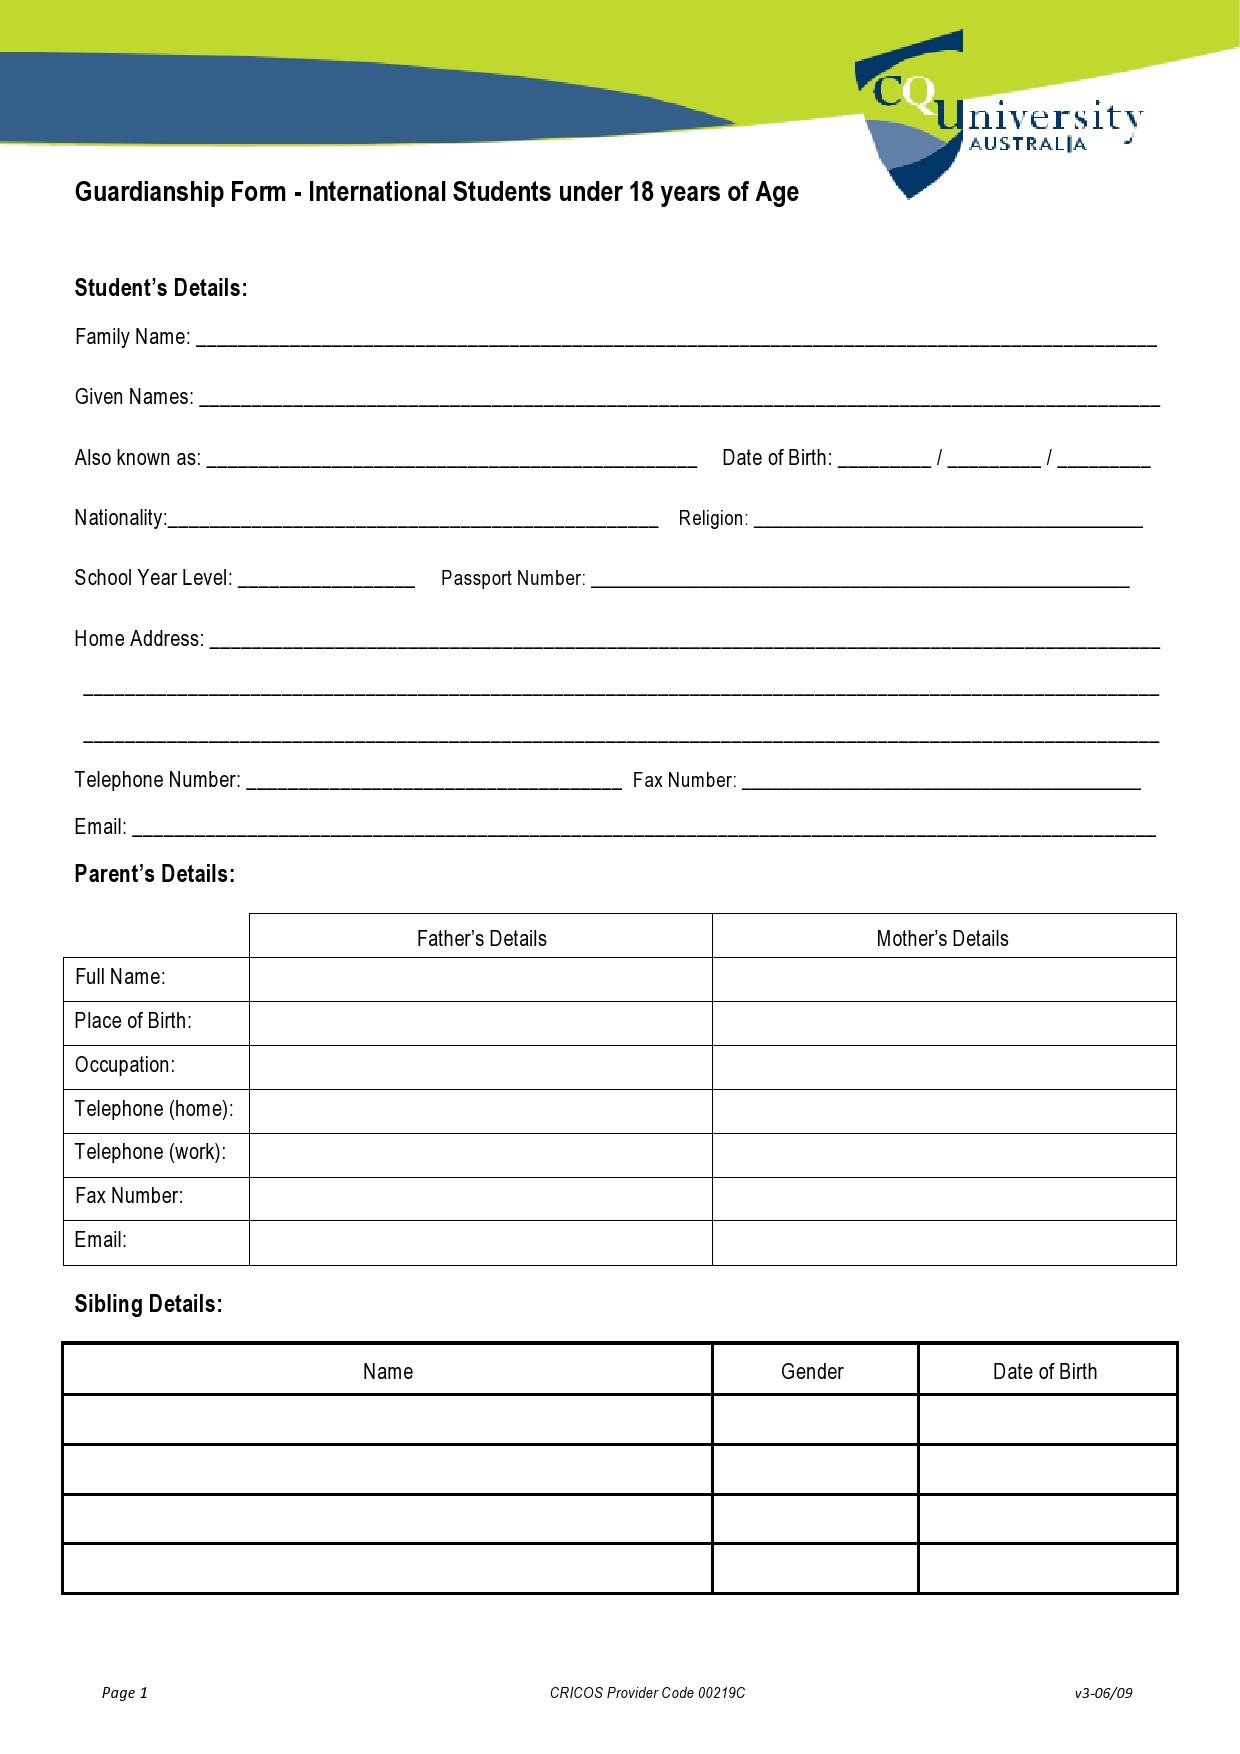 Free guardianship form 28